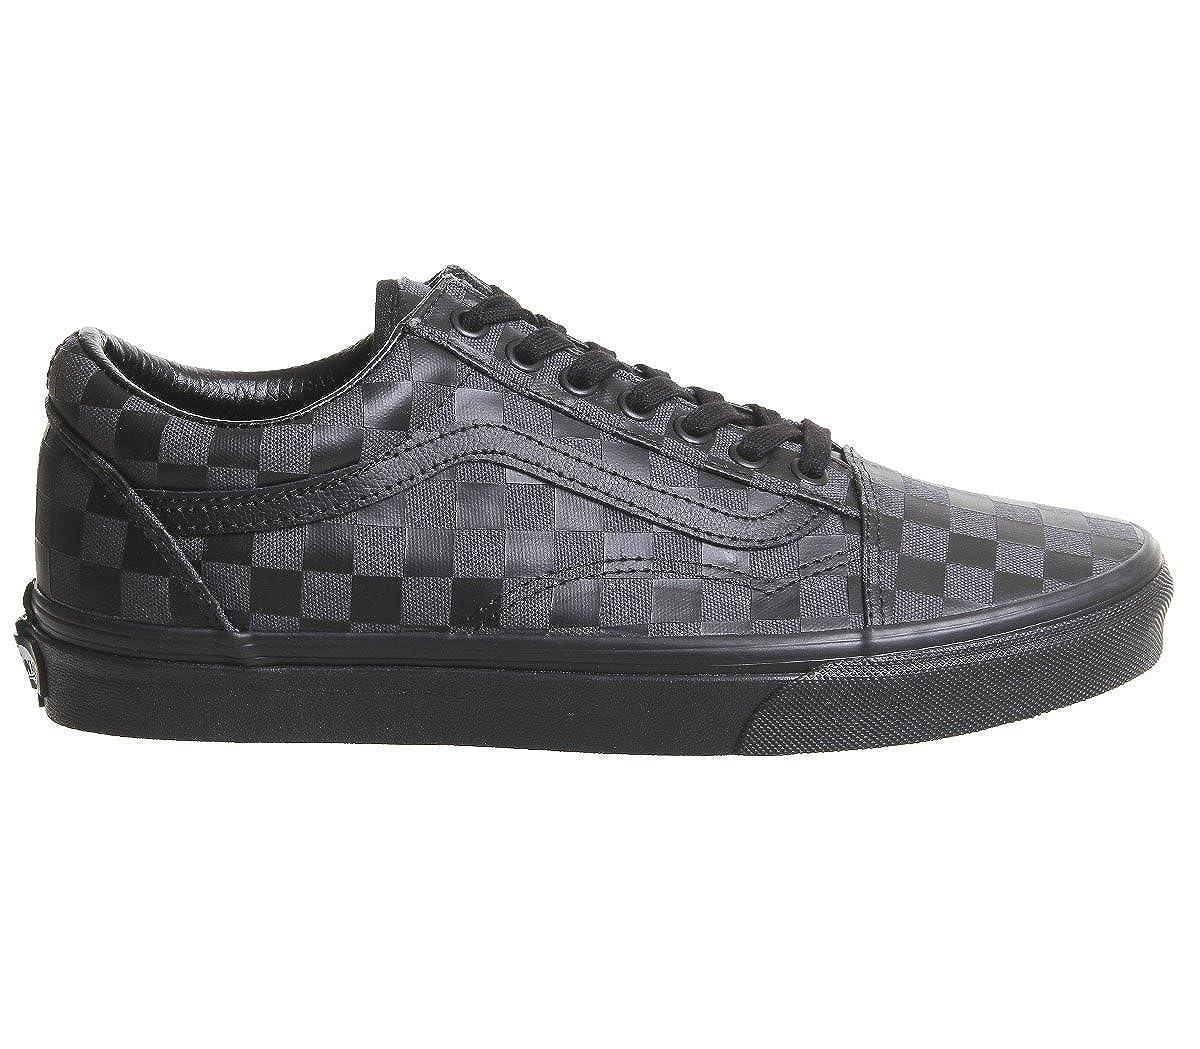 Acquista Vans Scarpe Uomo Sneaker Old Skool Classic in Pelle Nera VN0A38G1U5B miglior prezzo offerta